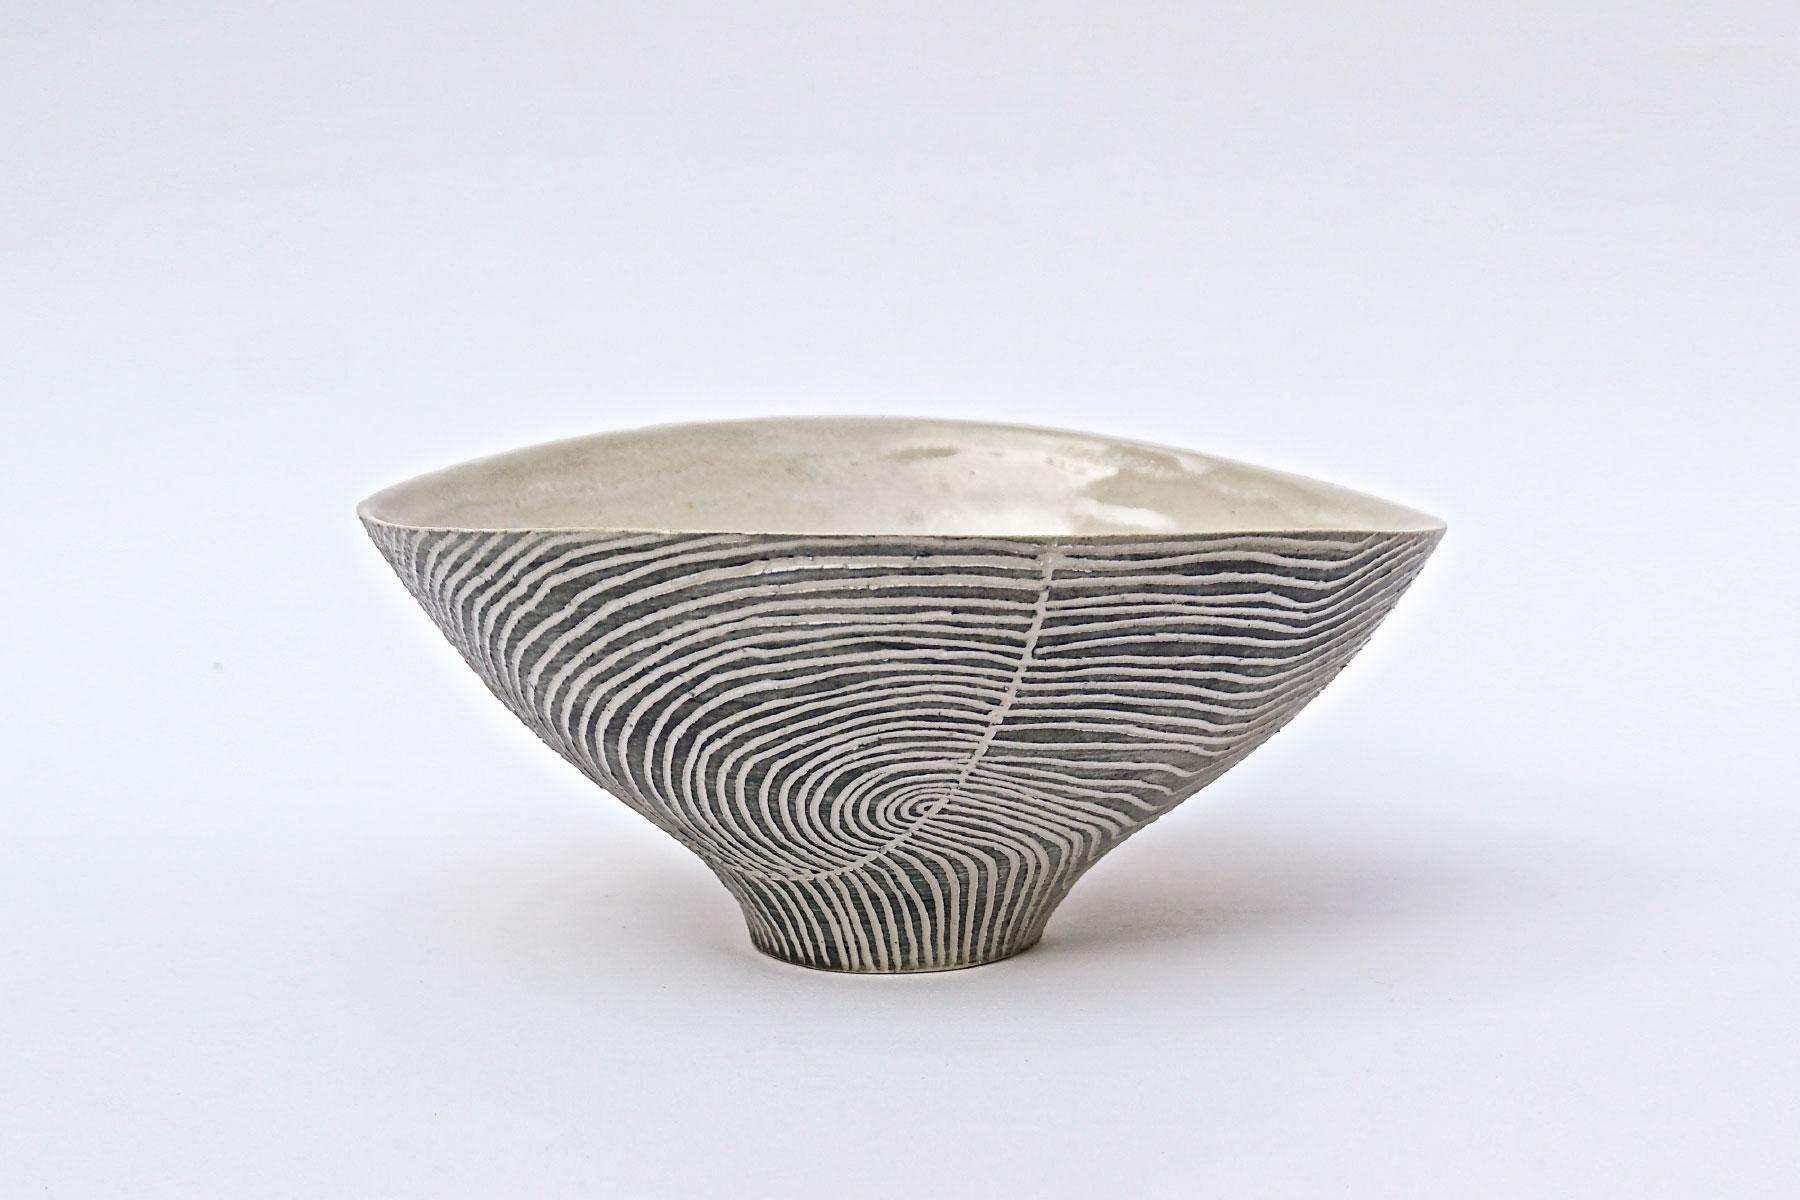 Bowl Contour Lines Bowl White Stoneware 1260 C Sara Federici Italiano Plurale artist